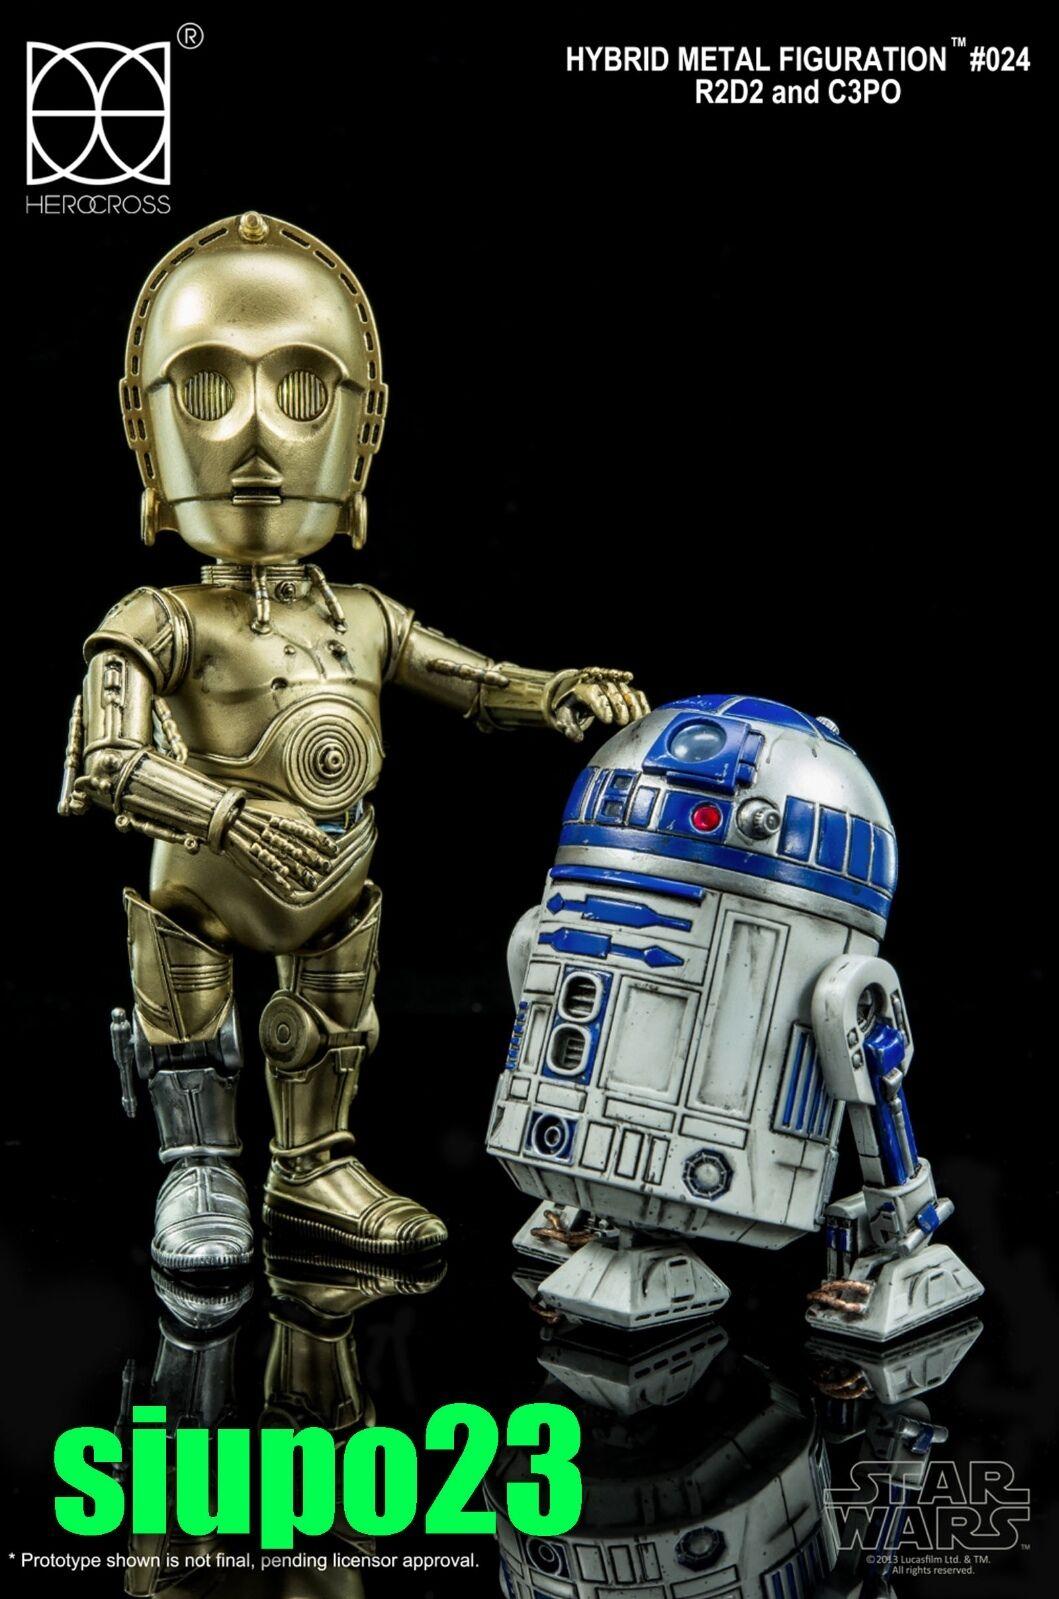 86hero Herocross  HMF Star Wars R2D2 & C3PO Figure